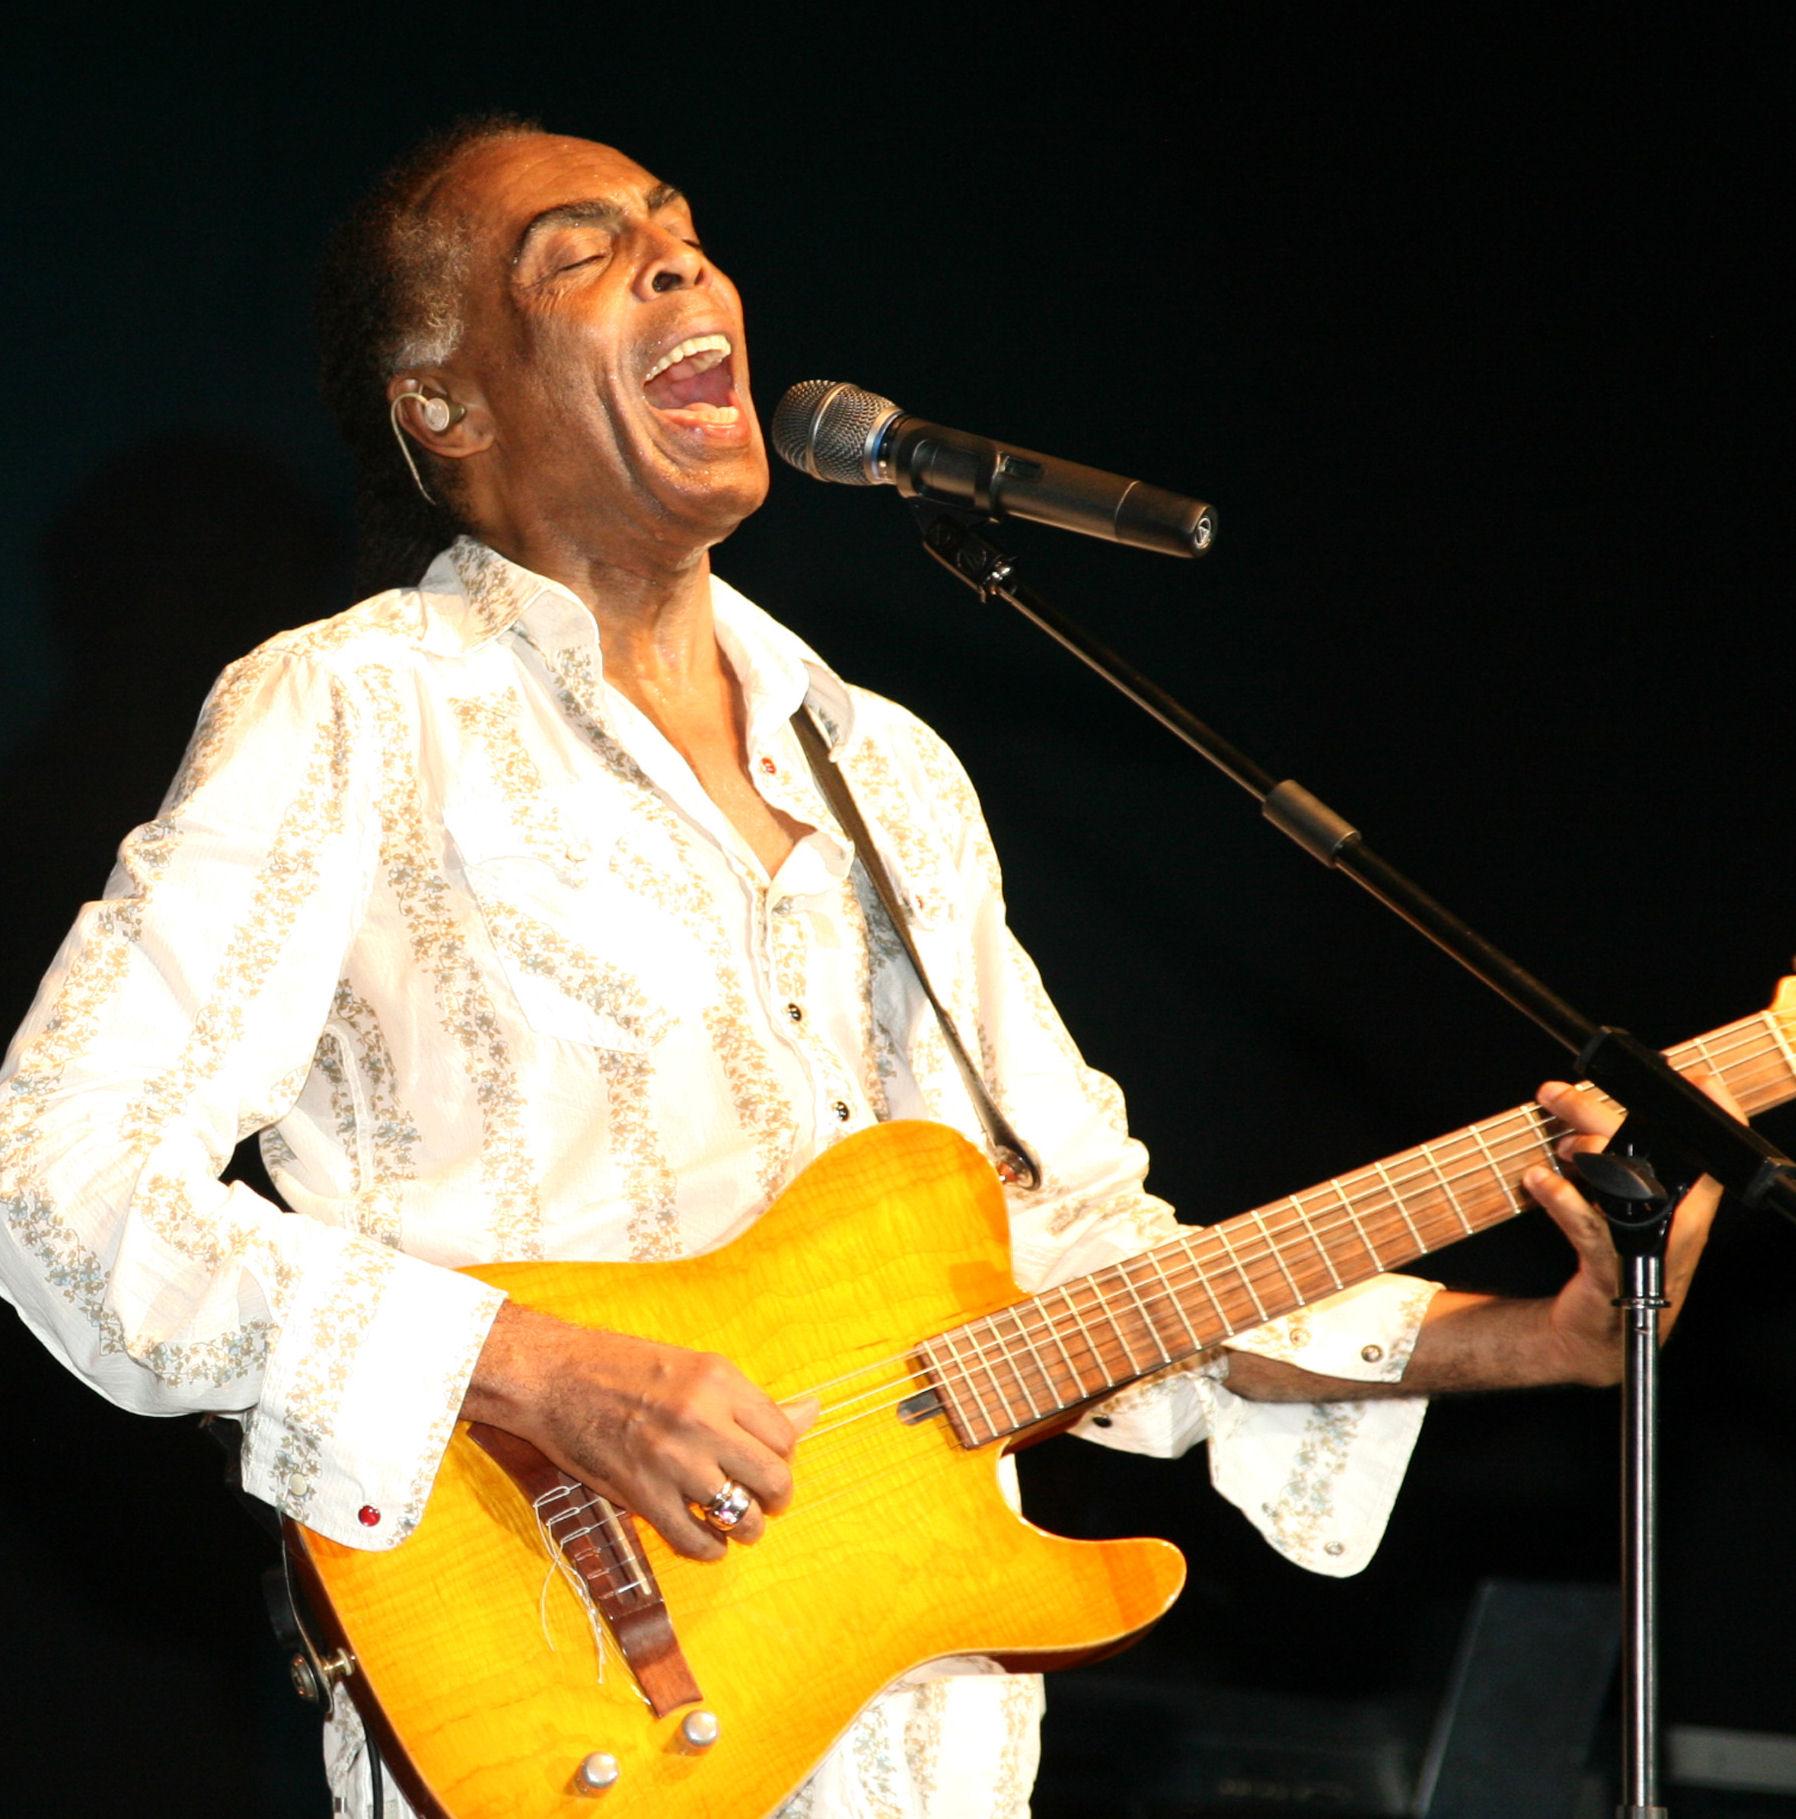 Gilberto Gil Culture Project